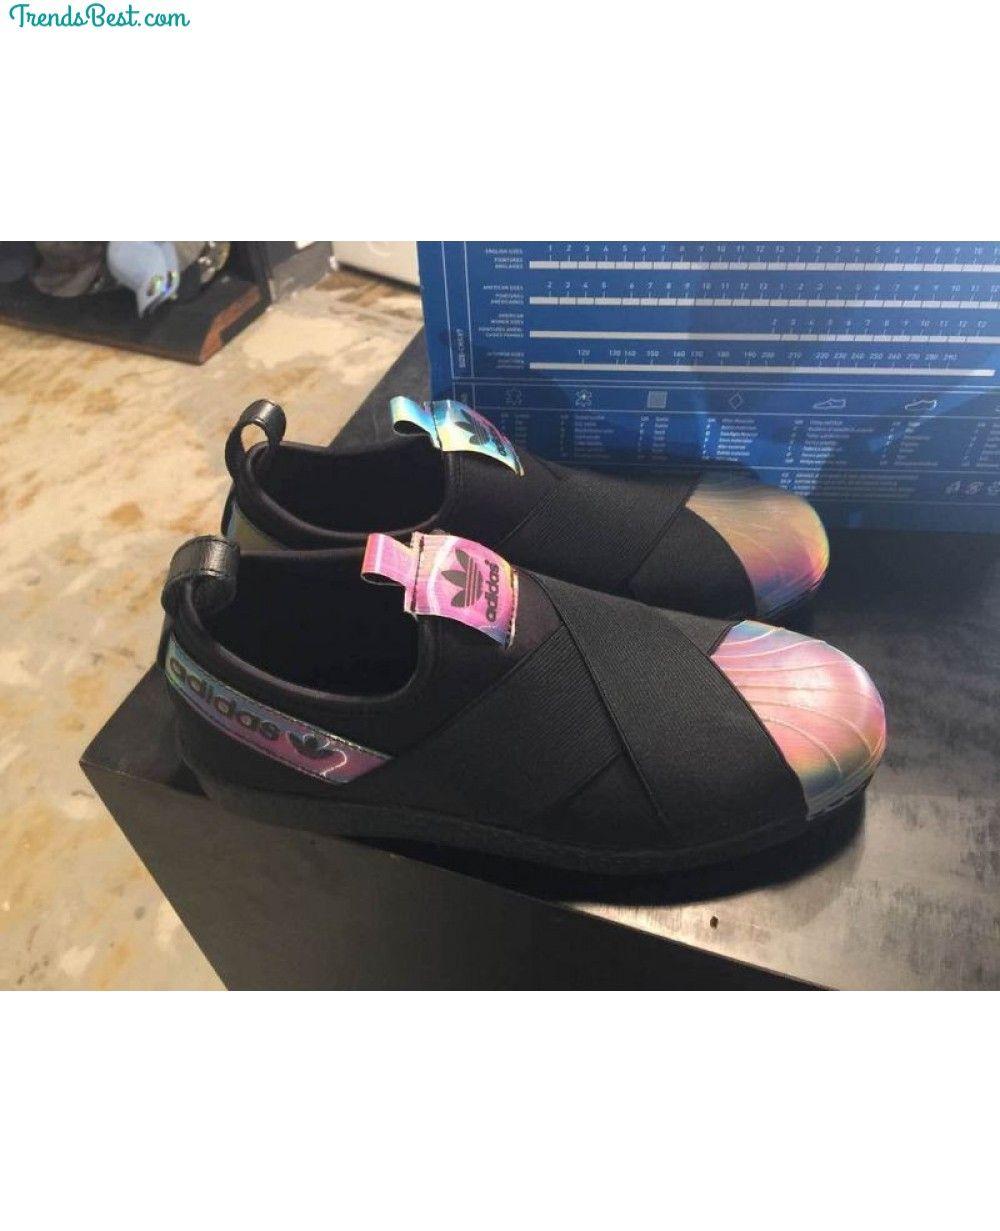 Adidas x Rita Ora Superstar Slip On W Black Hologram Iridescent ... fffdb8b8acc6